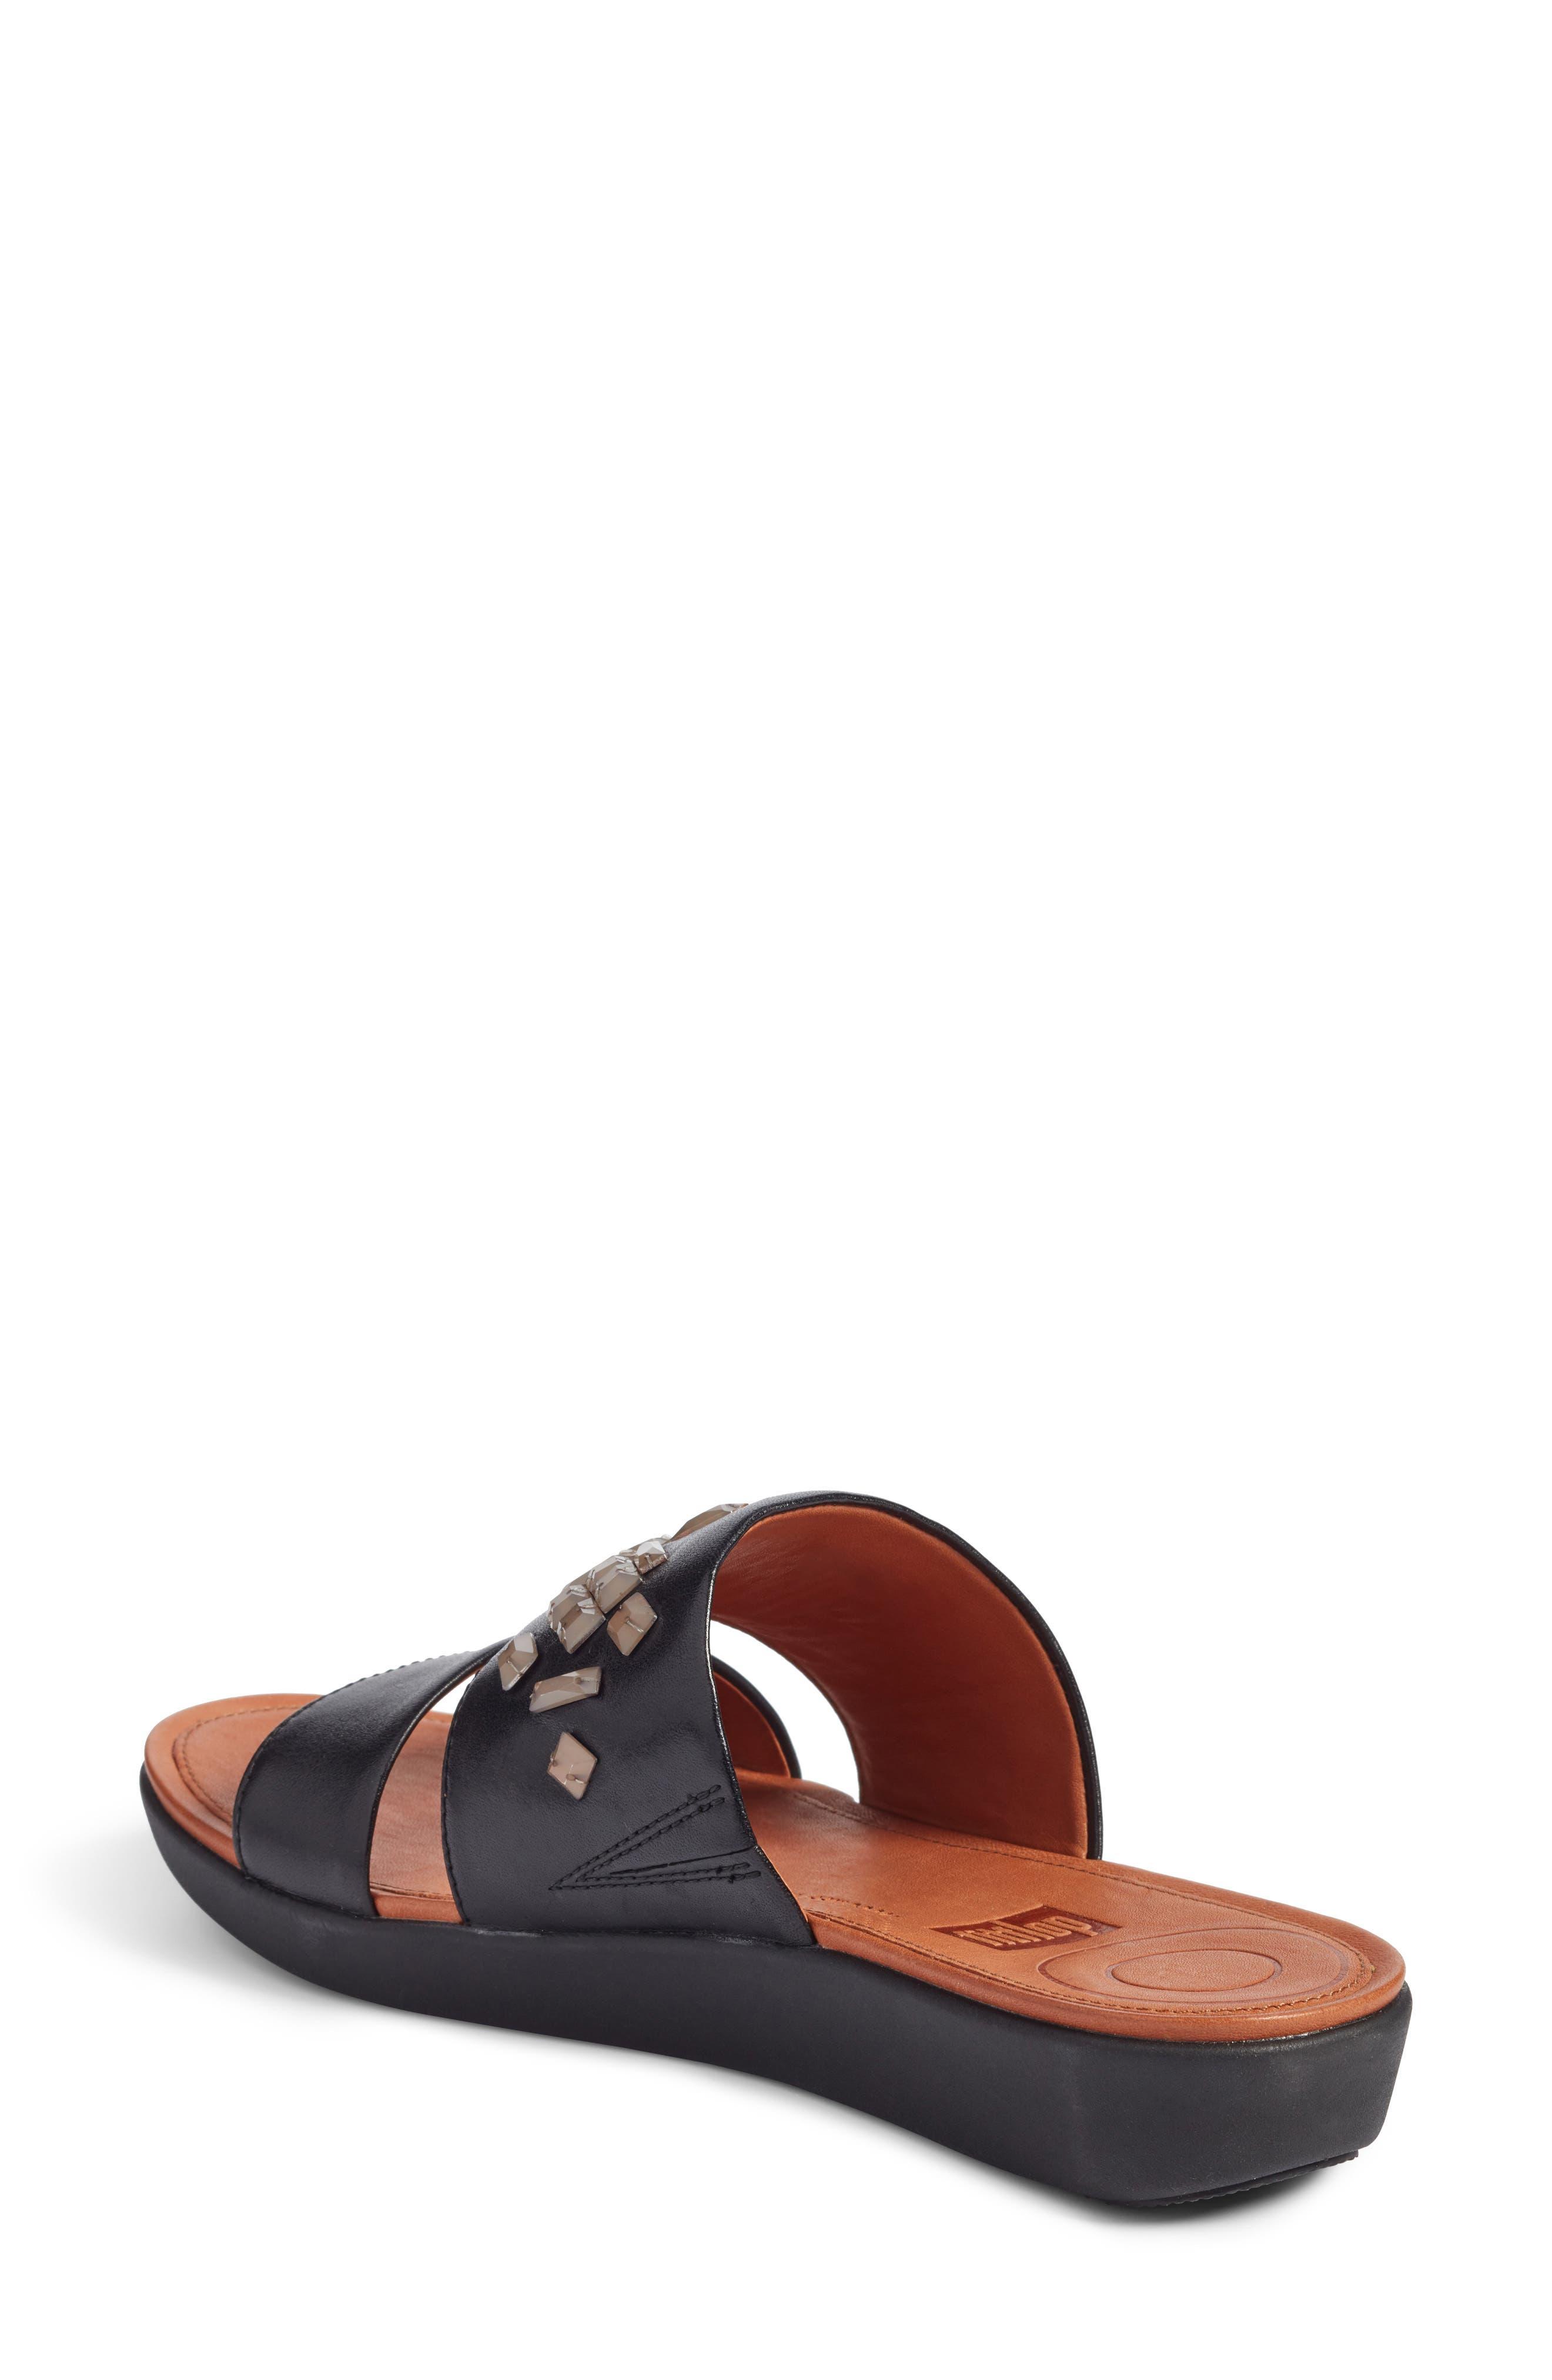 Alternate Image 2  - FitFlop Delta Slide Sandal (Women)